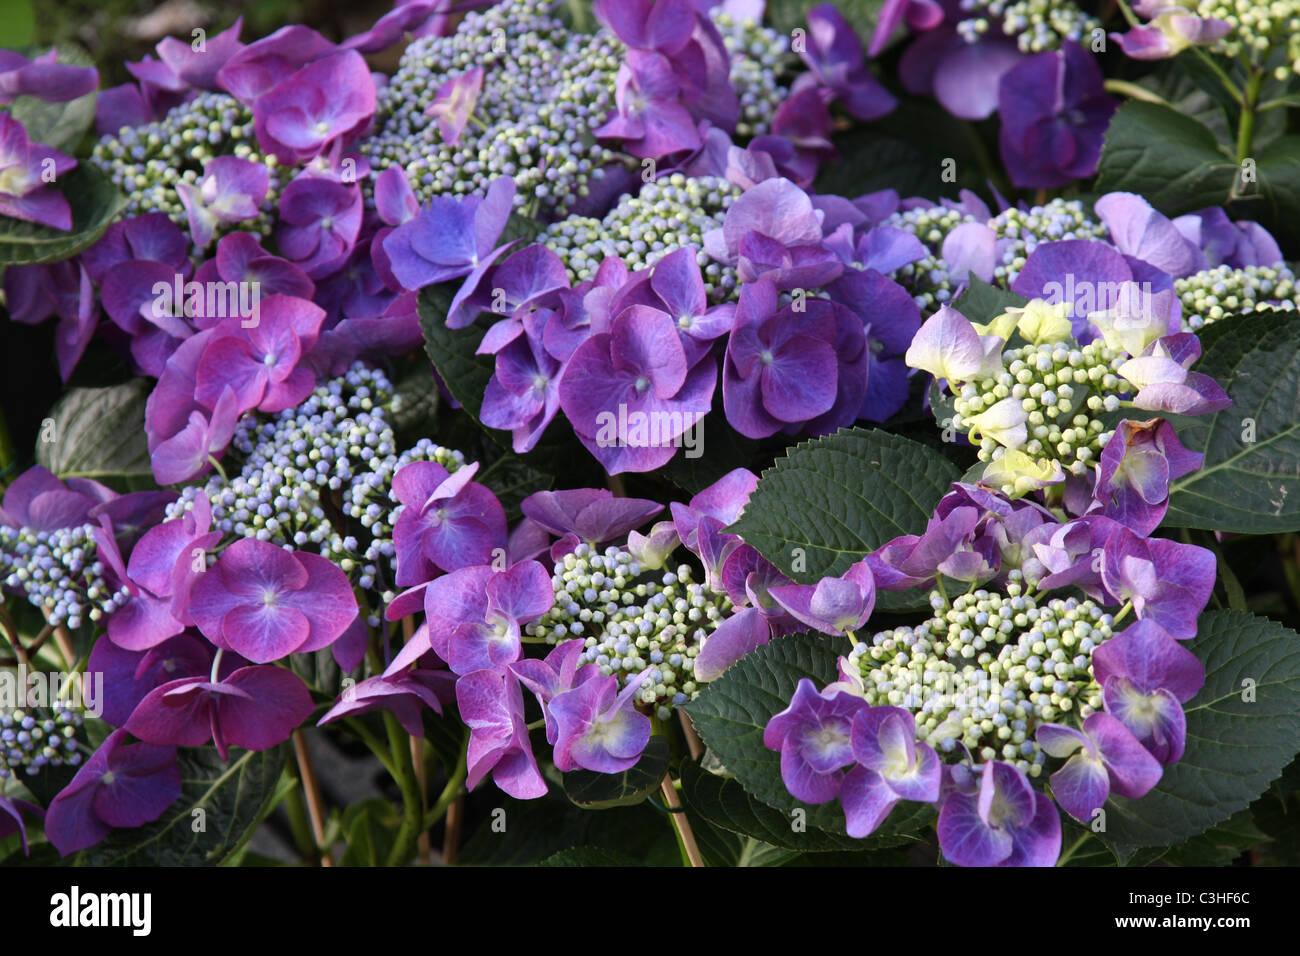 Hortensien, lila, Blueten, Hydrangea, Hortensia, purple blossom - Stock Image